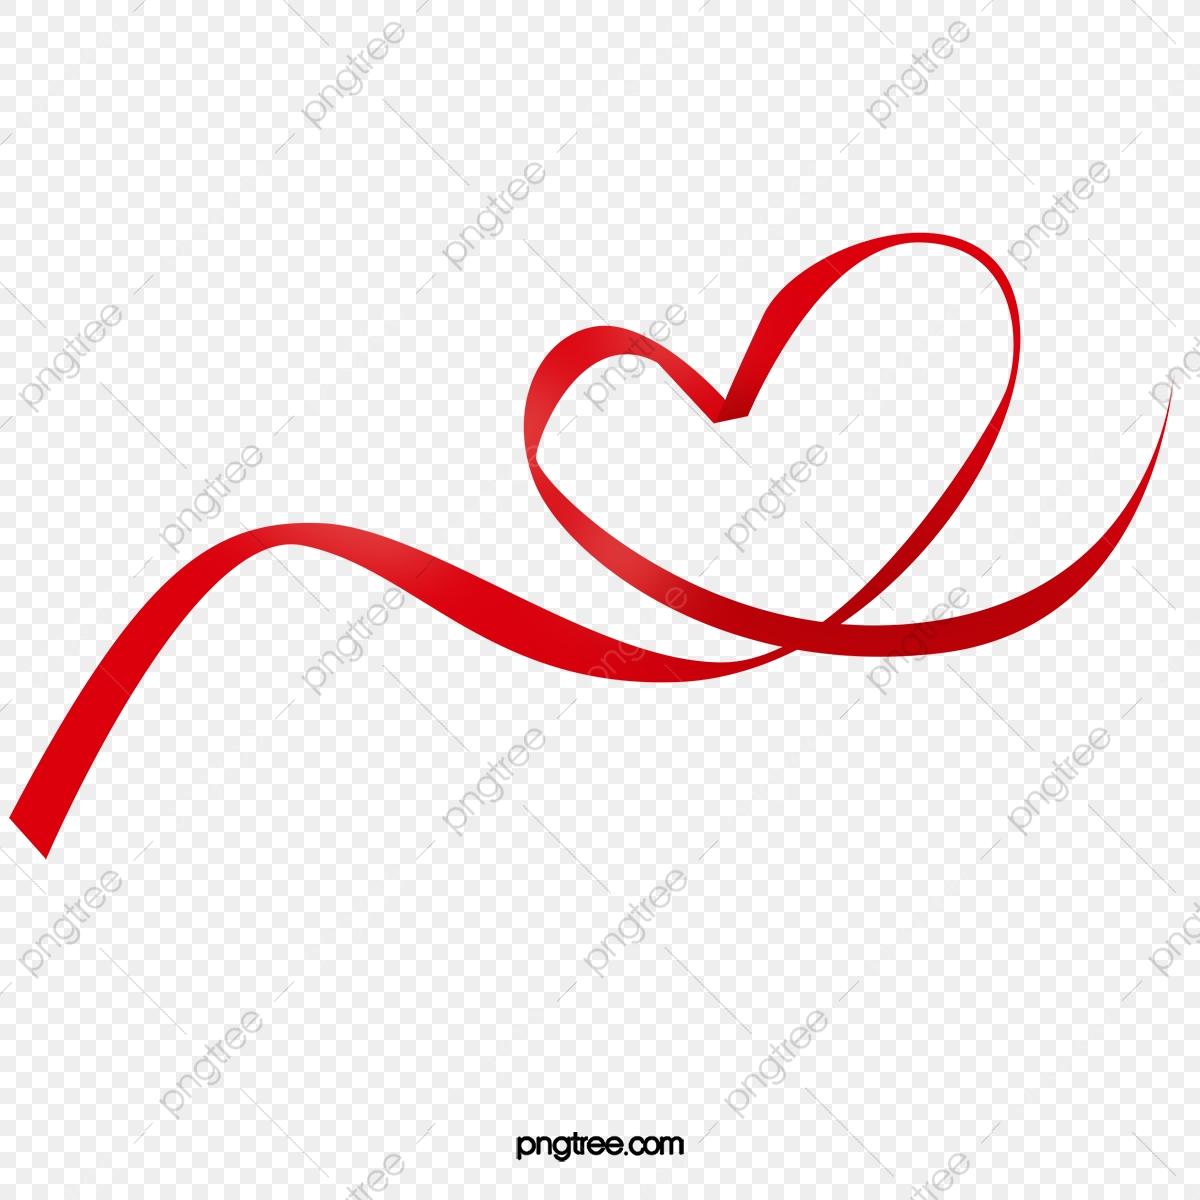 Heart Ribbon Heart Outline, Heart Clipart, Ribbon Clipart, Heart.